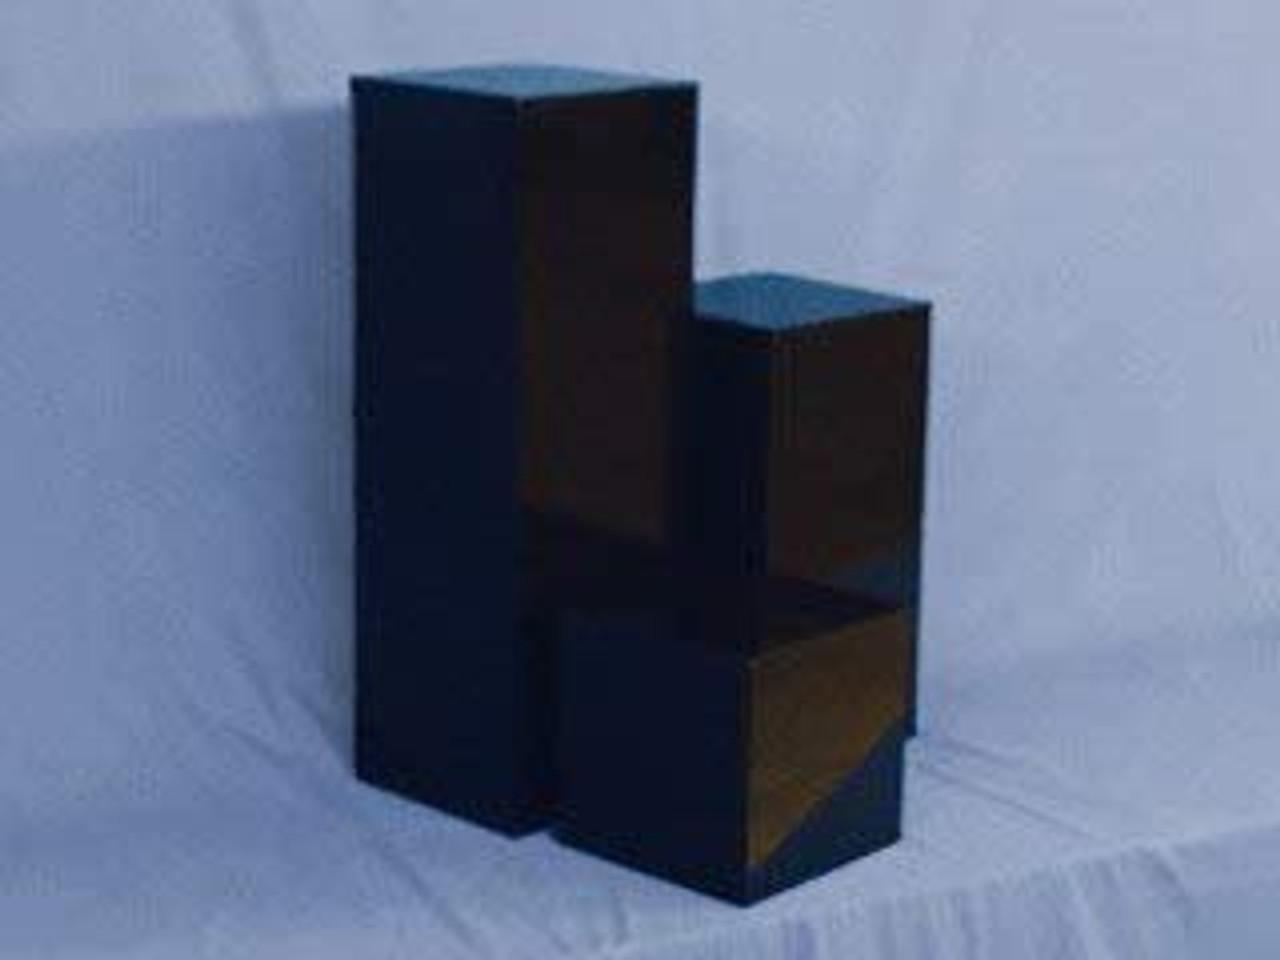 Black Square Acrylic Display Cube, 24 Inch